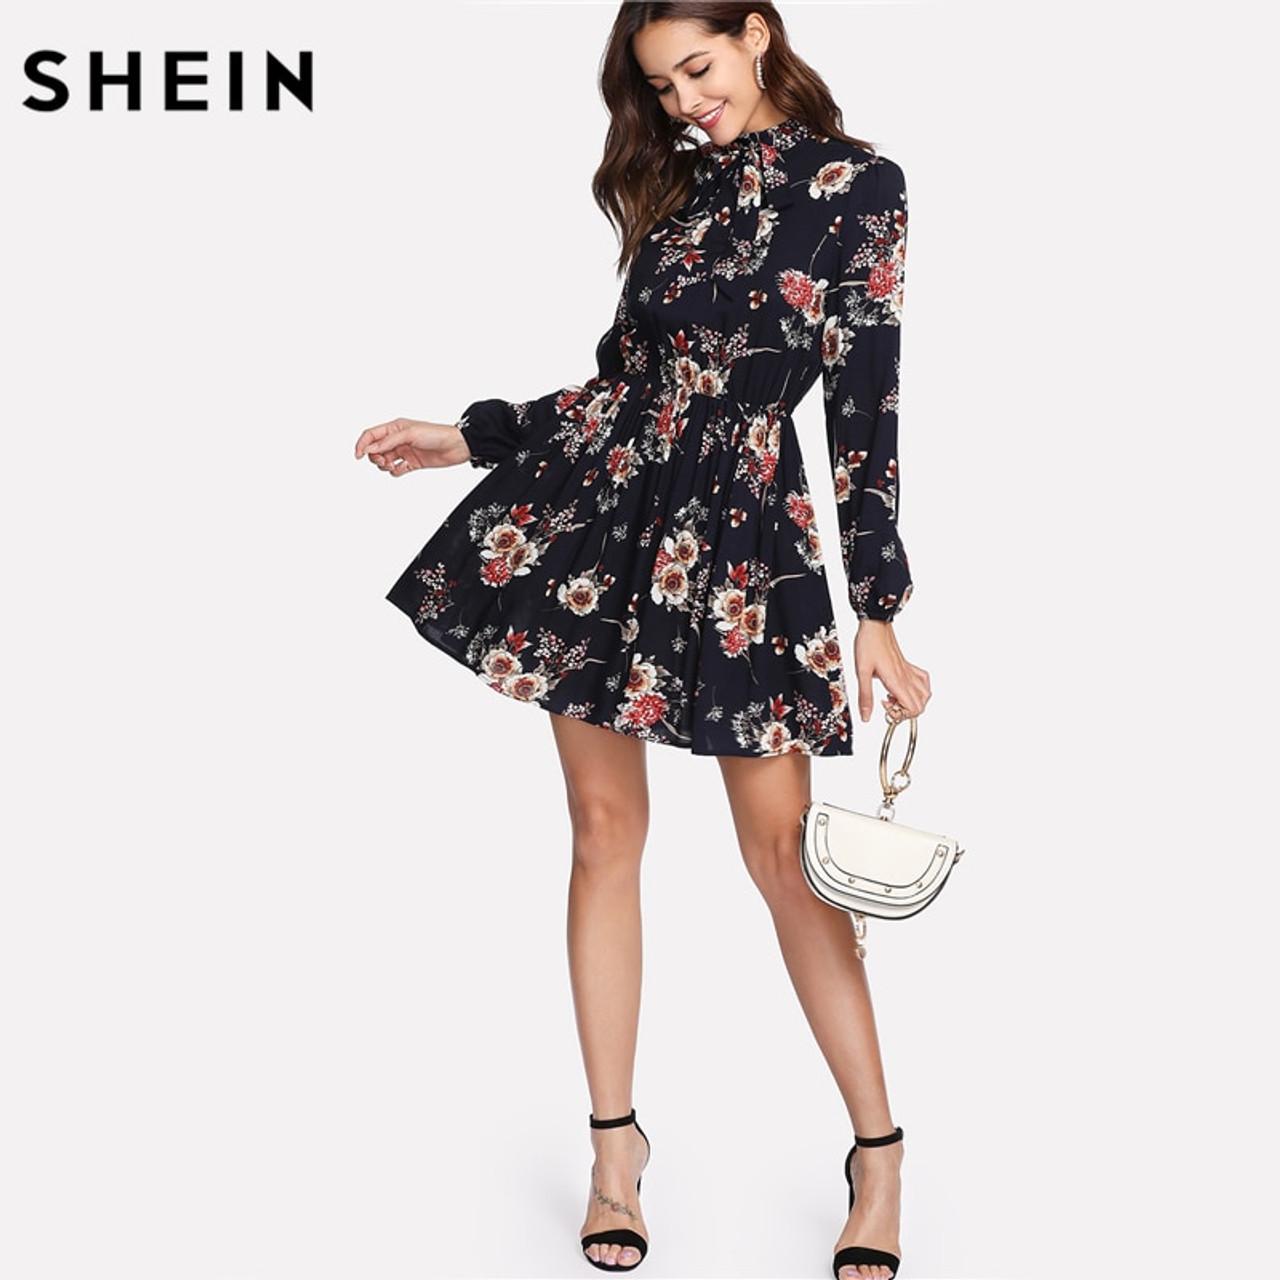 3bfd1a38c395 ... SHEIN Autumn Floral Women Dresses Multicolor Elegant Long Sleeve High  Waist A Line Chic Dress Ladies ...